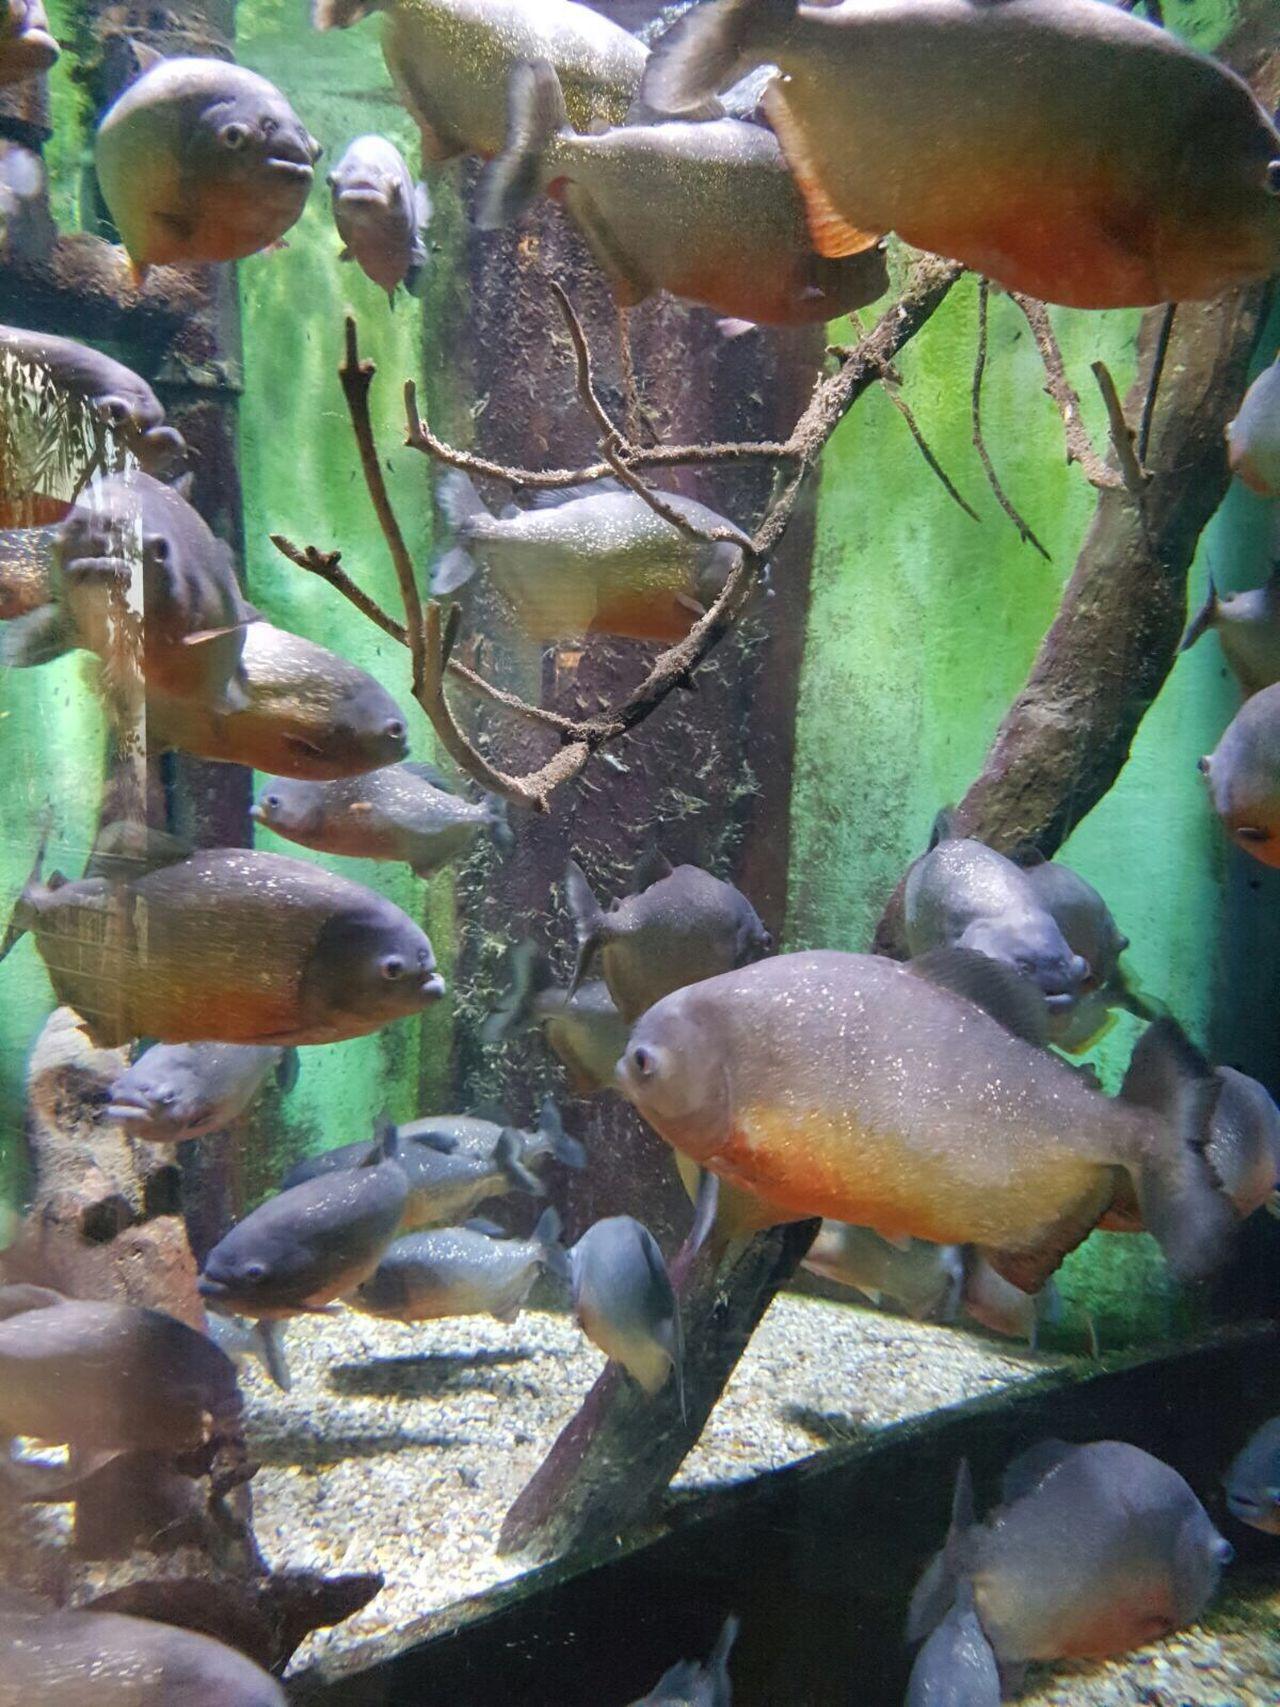 Piranhas Beautiful But Deadly Fish Fish Animals Scales And Fins Aquarium